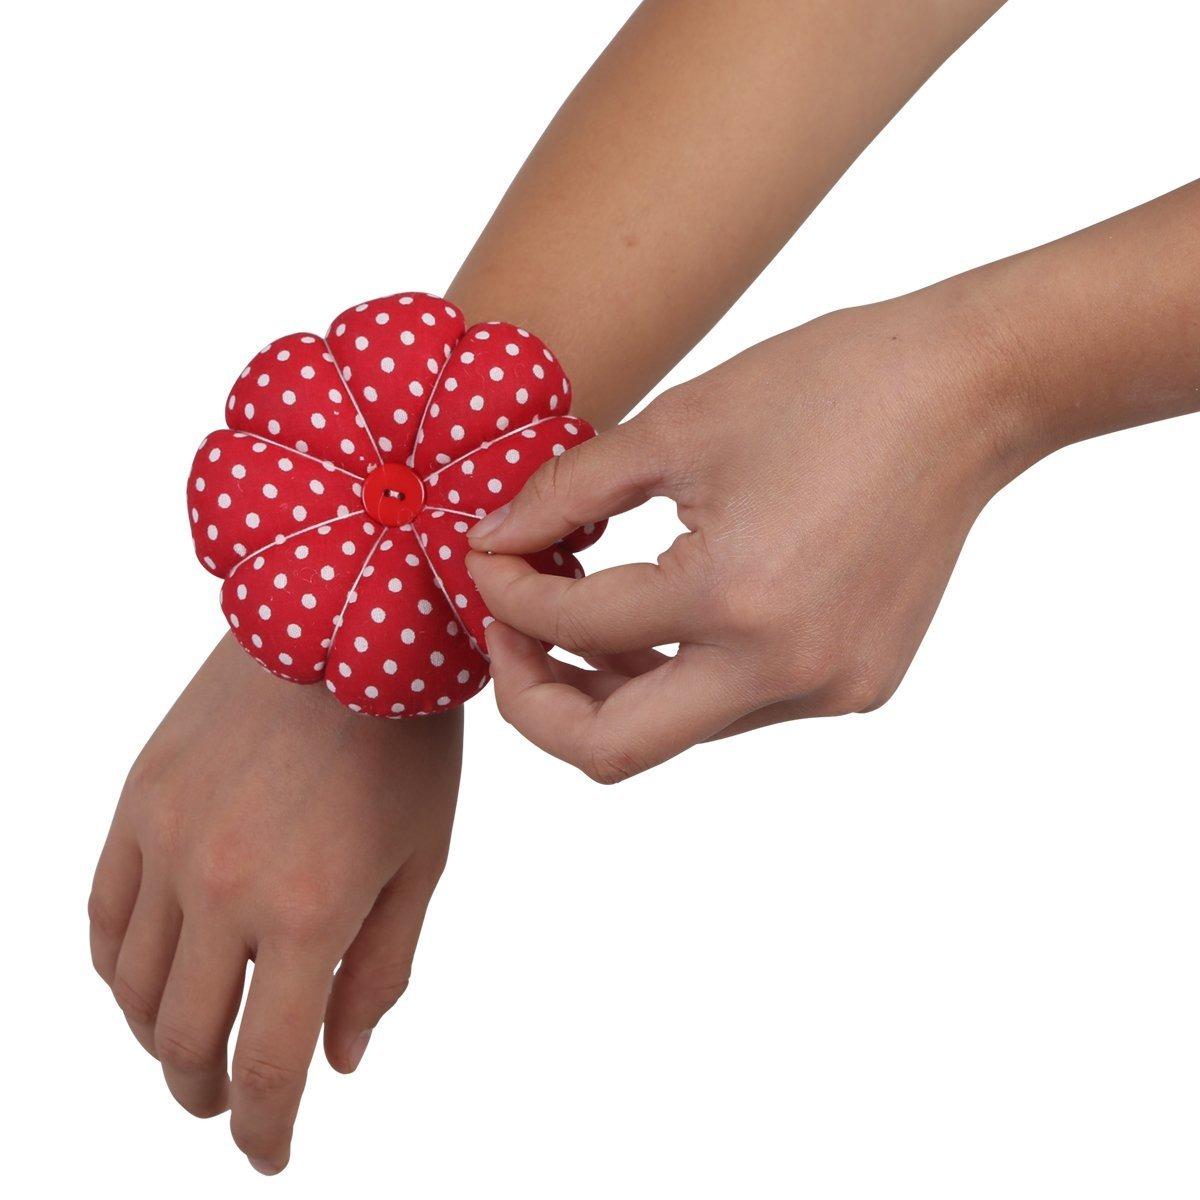 NEOVIVA Wrist Wearable Pin Cushions Set of 2 Style Pumpkin Polka Dots Tango Red